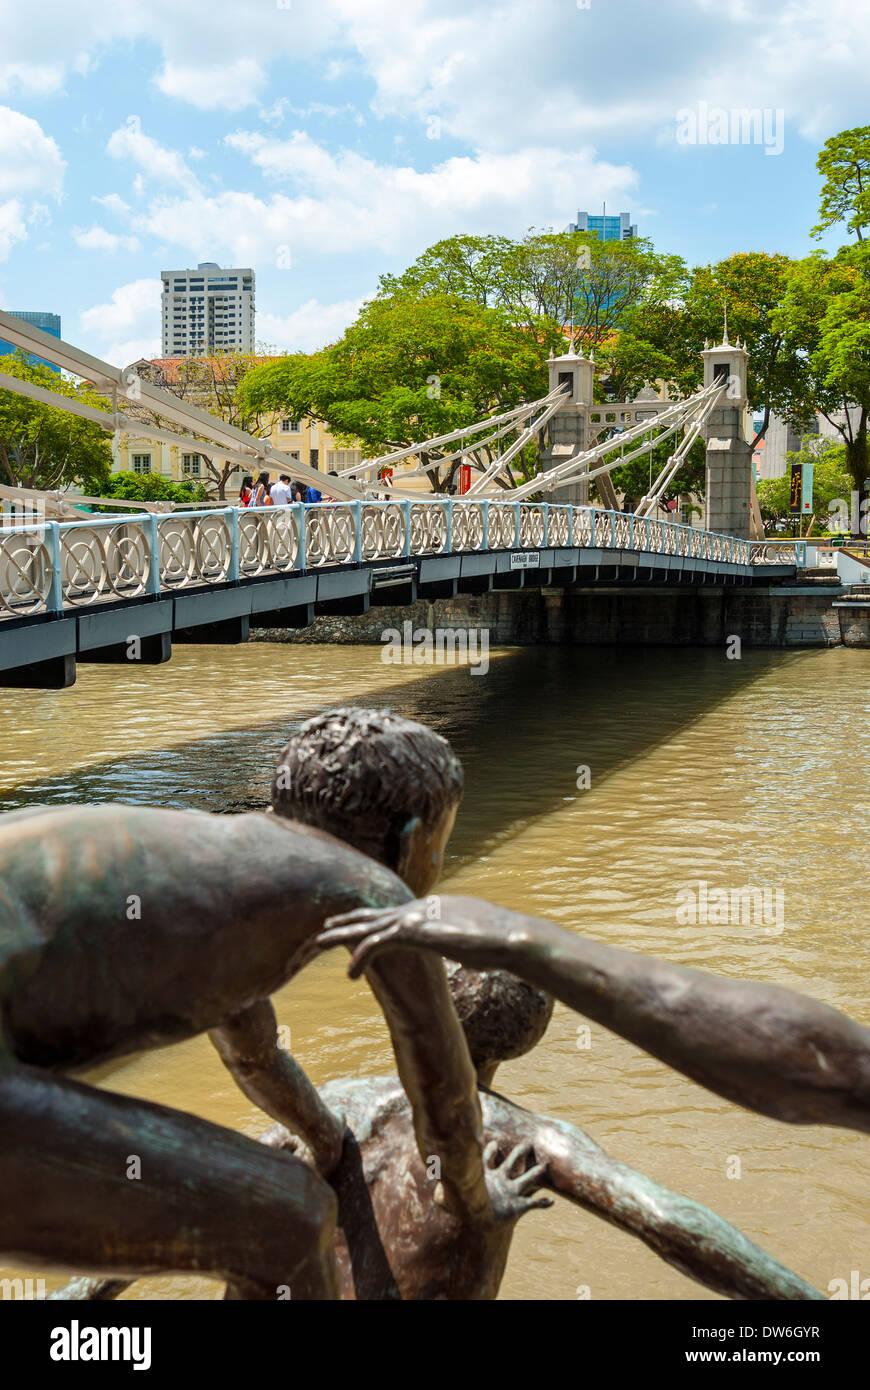 Swimming boys sculpture and Cavenagh bridge, Singapore - Stock Image